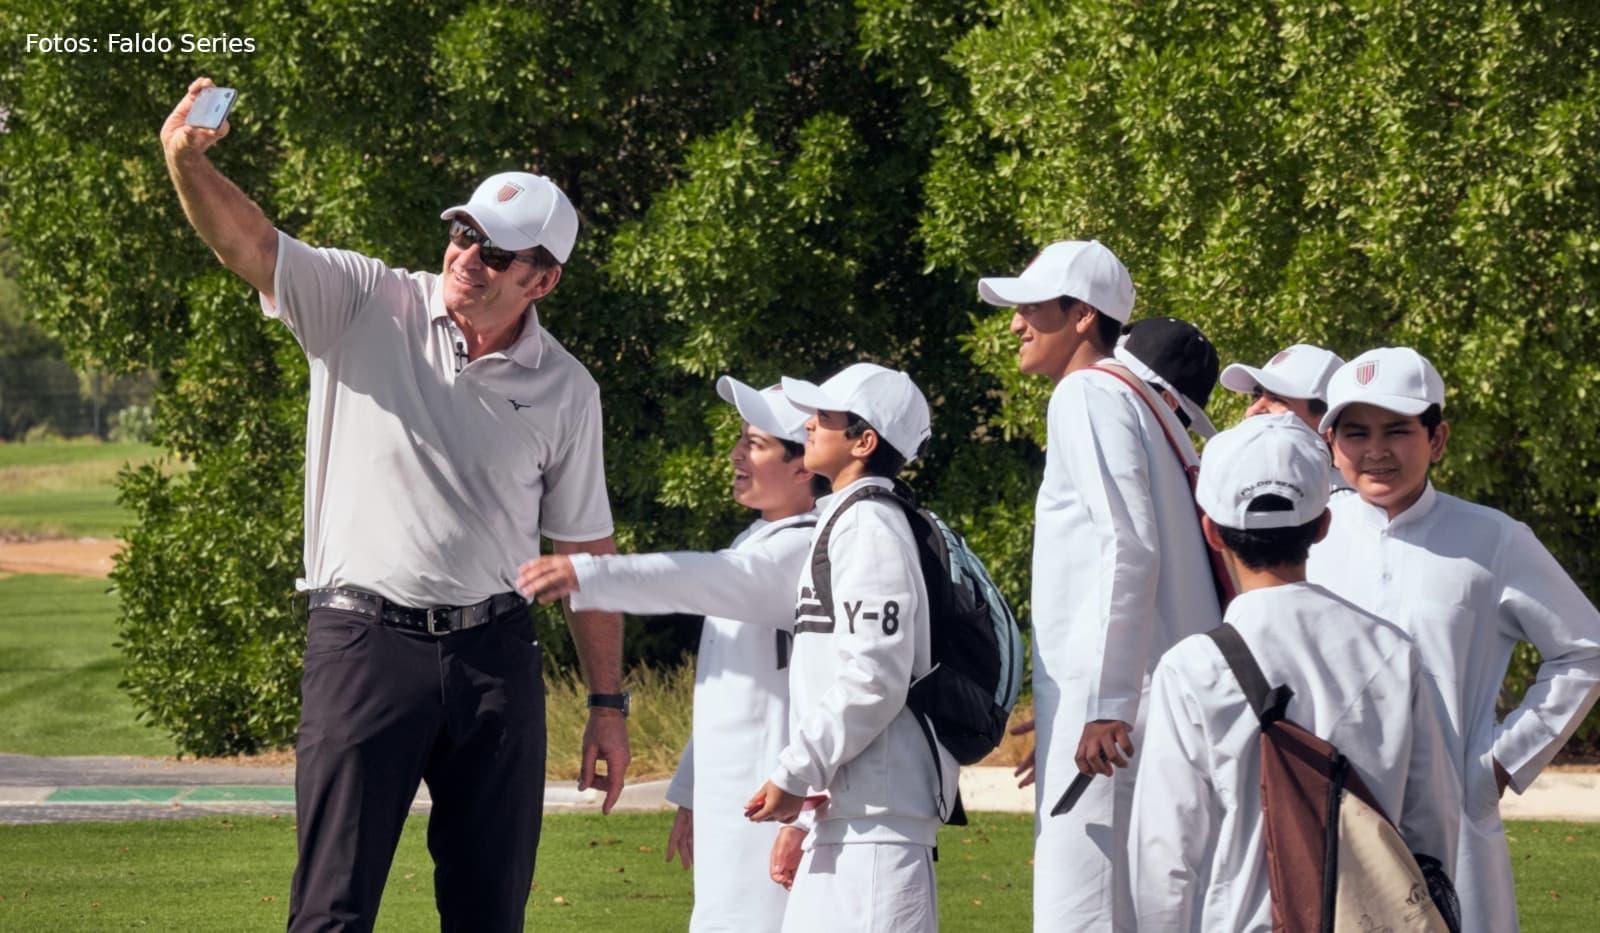 Faldo Series Sir Nick Faldo young golfers